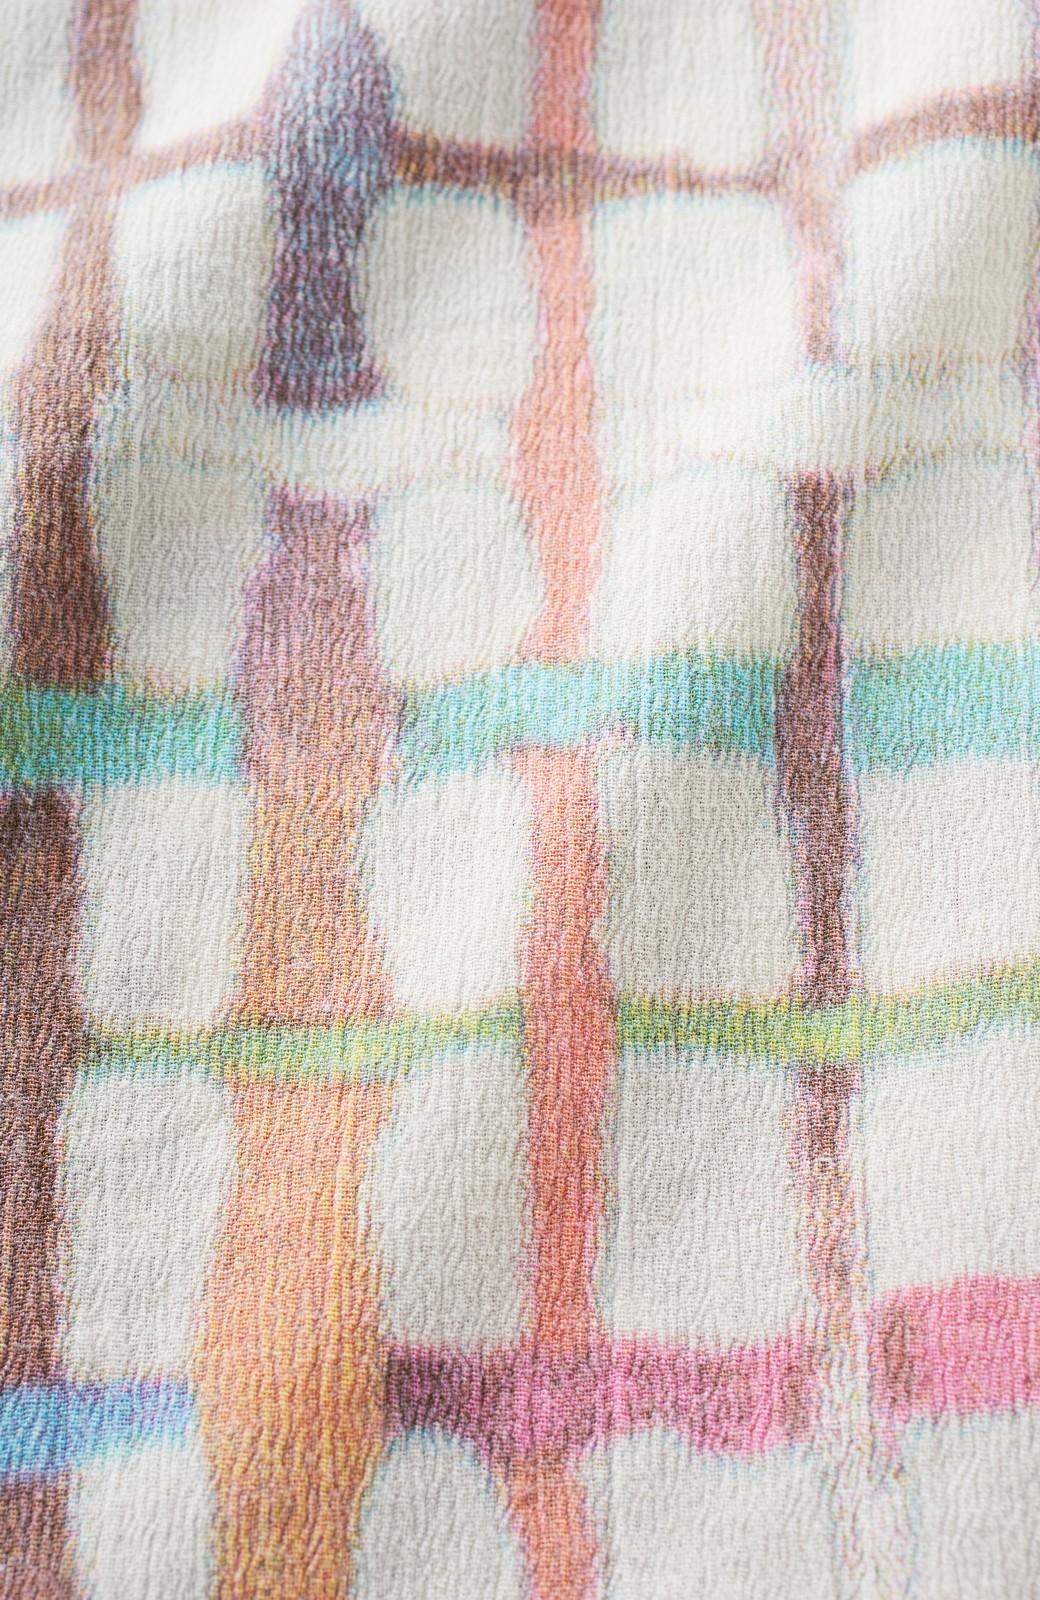 haco! 京都の浴衣屋さんと作った浴衣生地のスカート <ベージュ系その他>の商品写真2